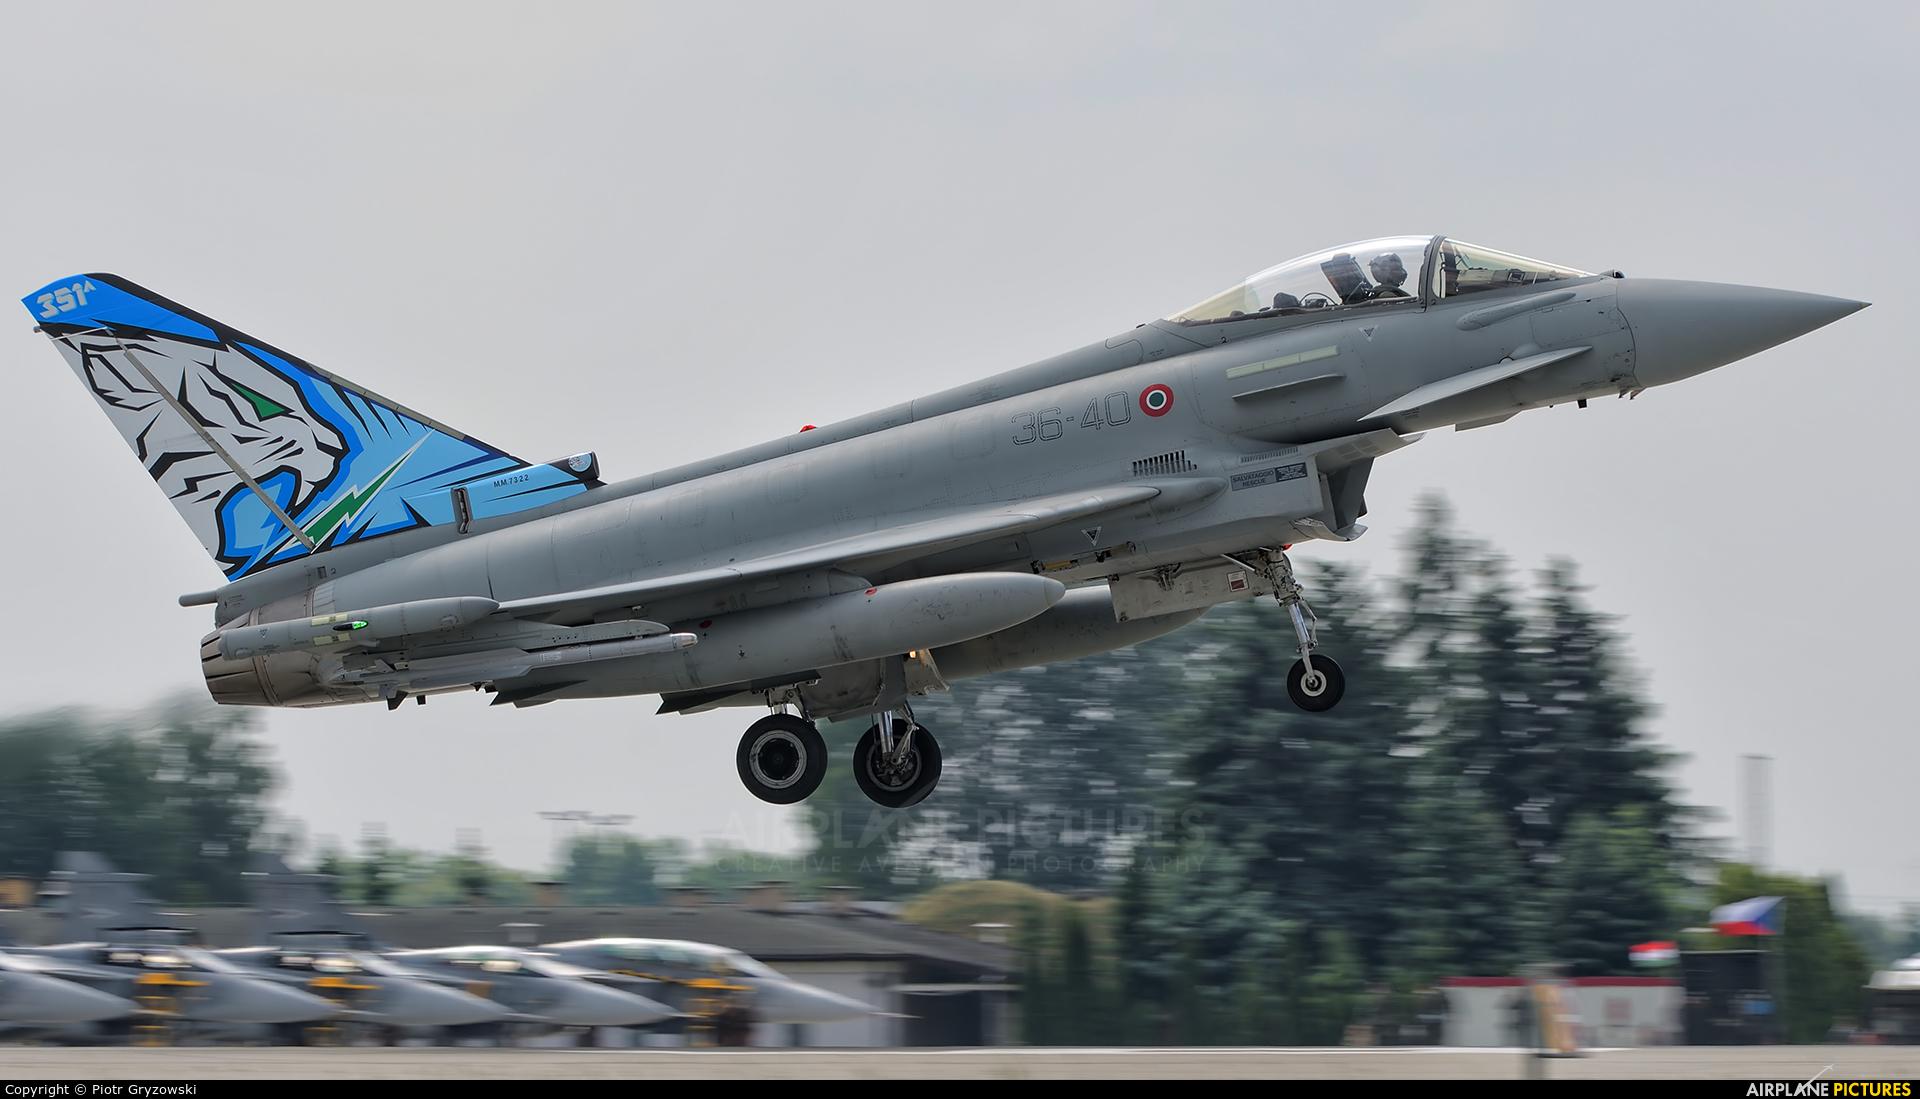 Italy - Air Force MM7322 aircraft at Poznań - Krzesiny